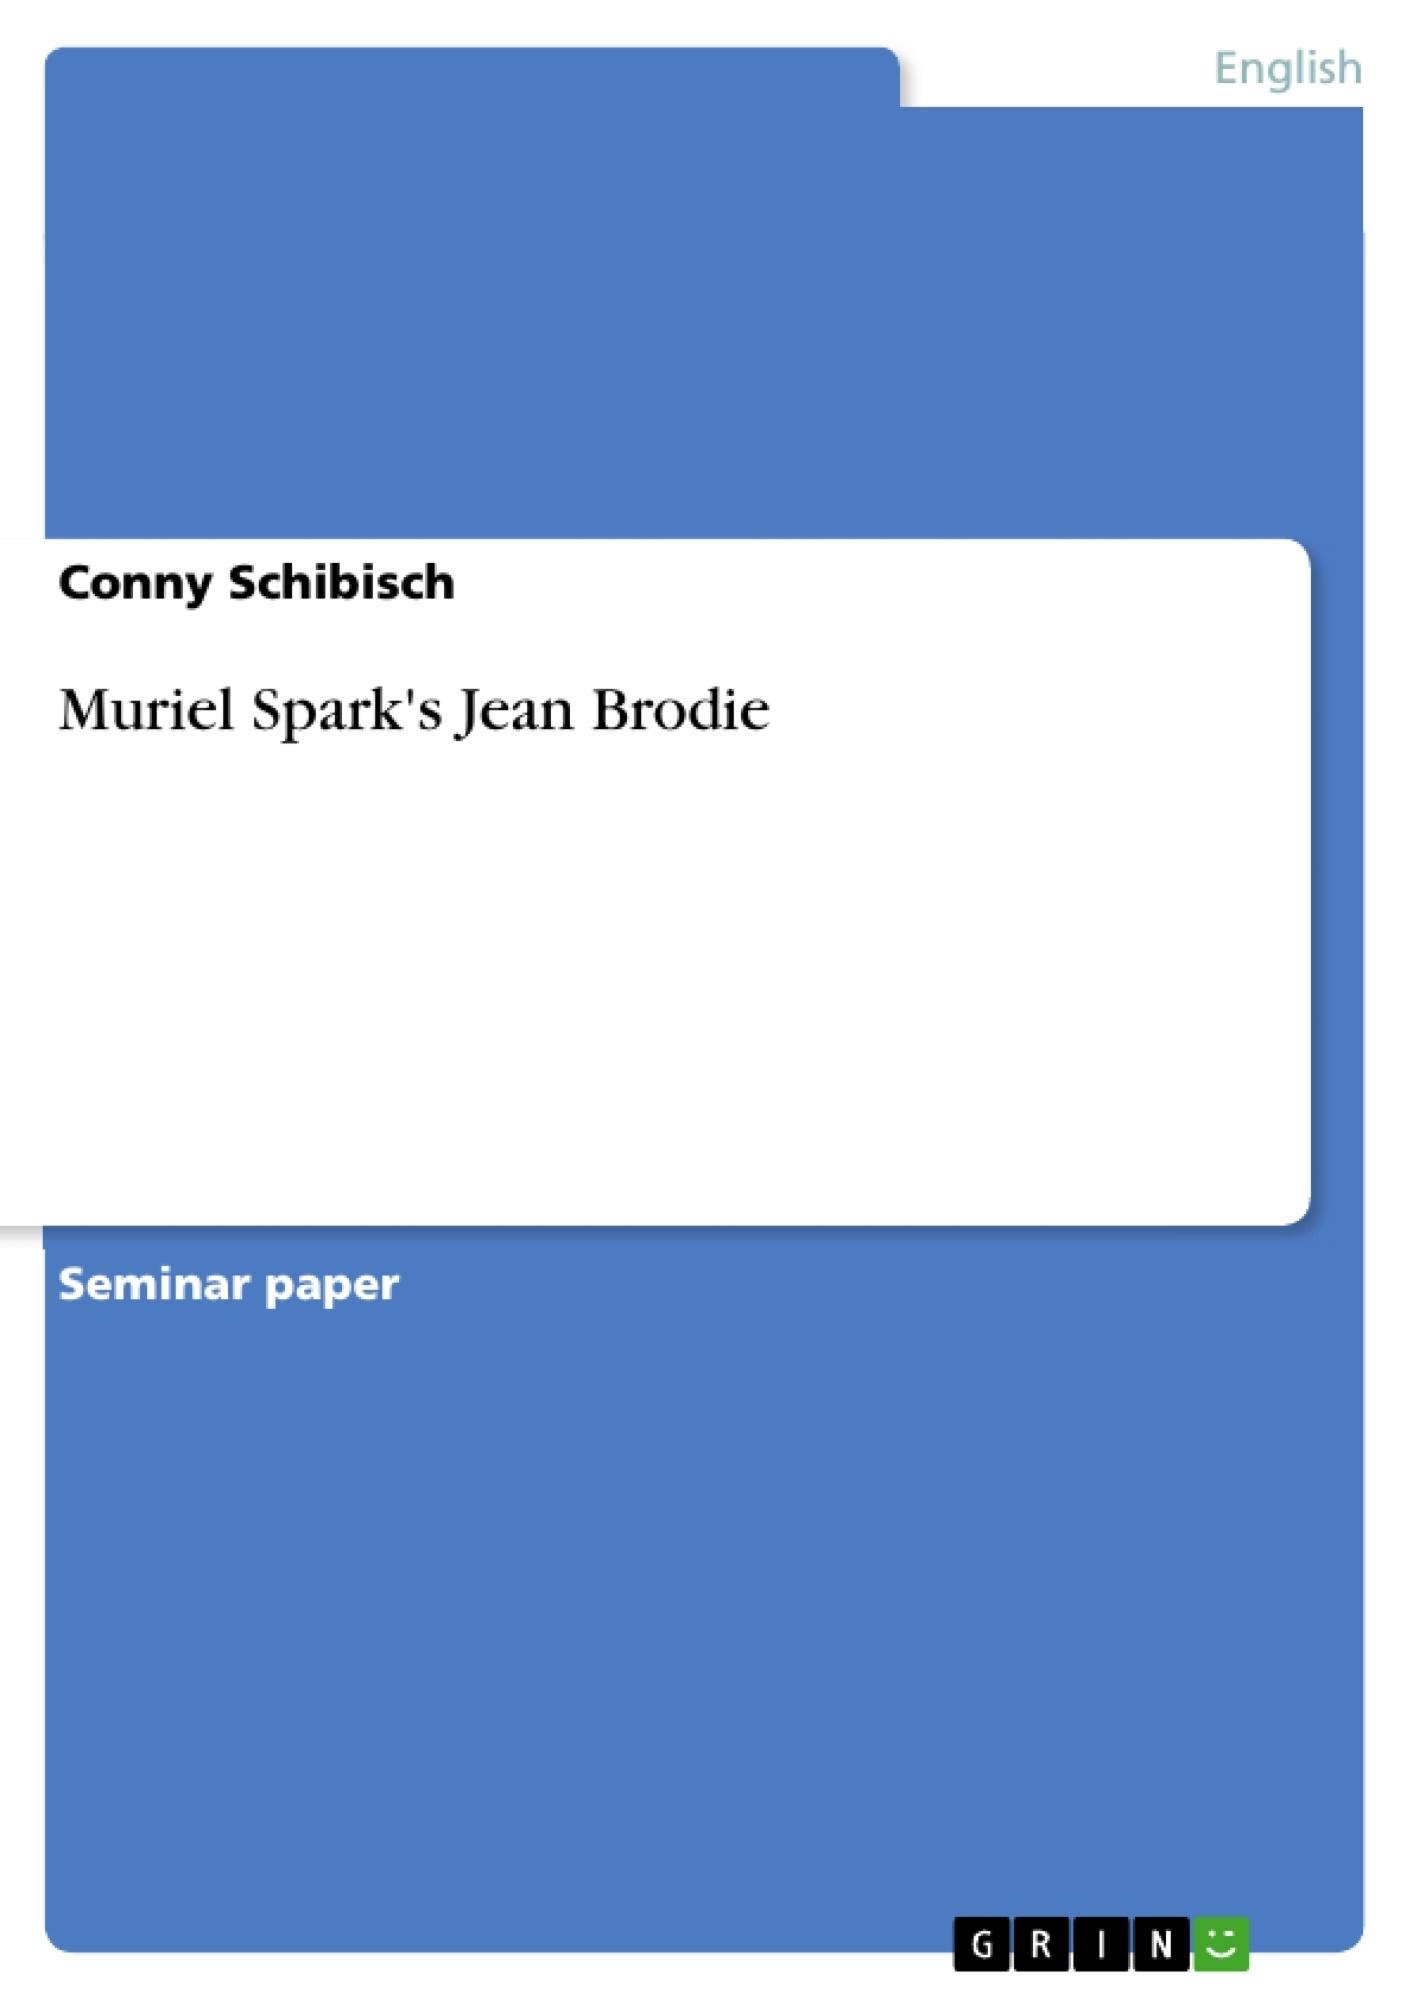 Title: Muriel Spark's Jean Brodie